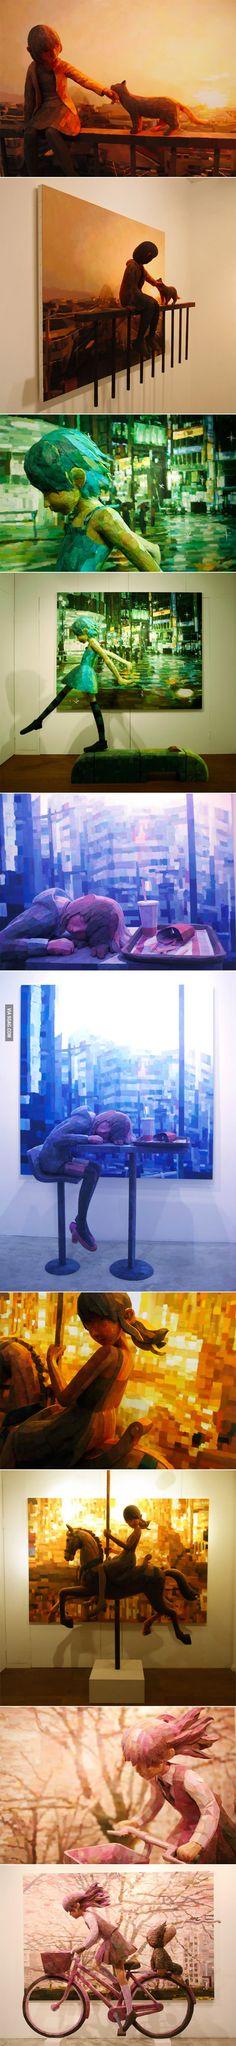 Japanese Artist - Shintaro Ohata   insanely cool